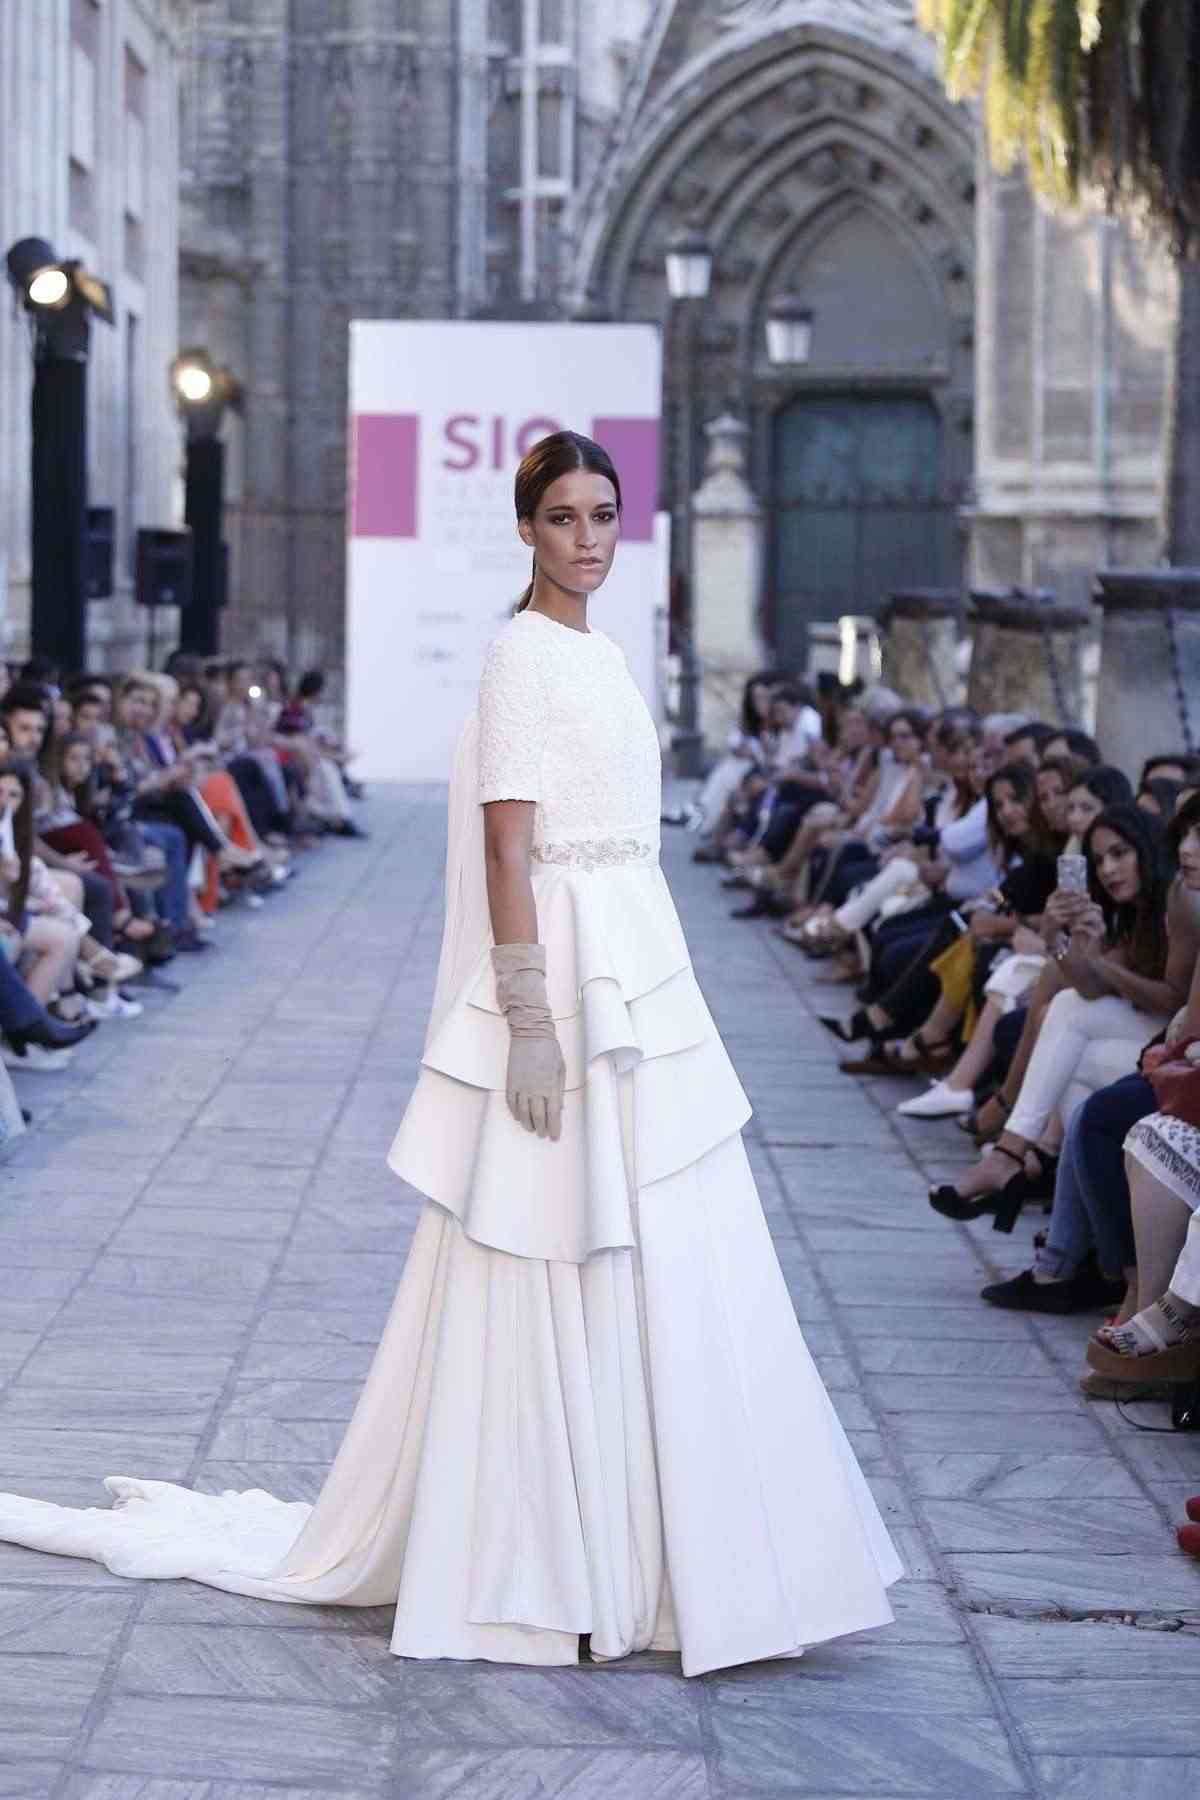 pasarela SIQ 2016 vestido ernesto sillero